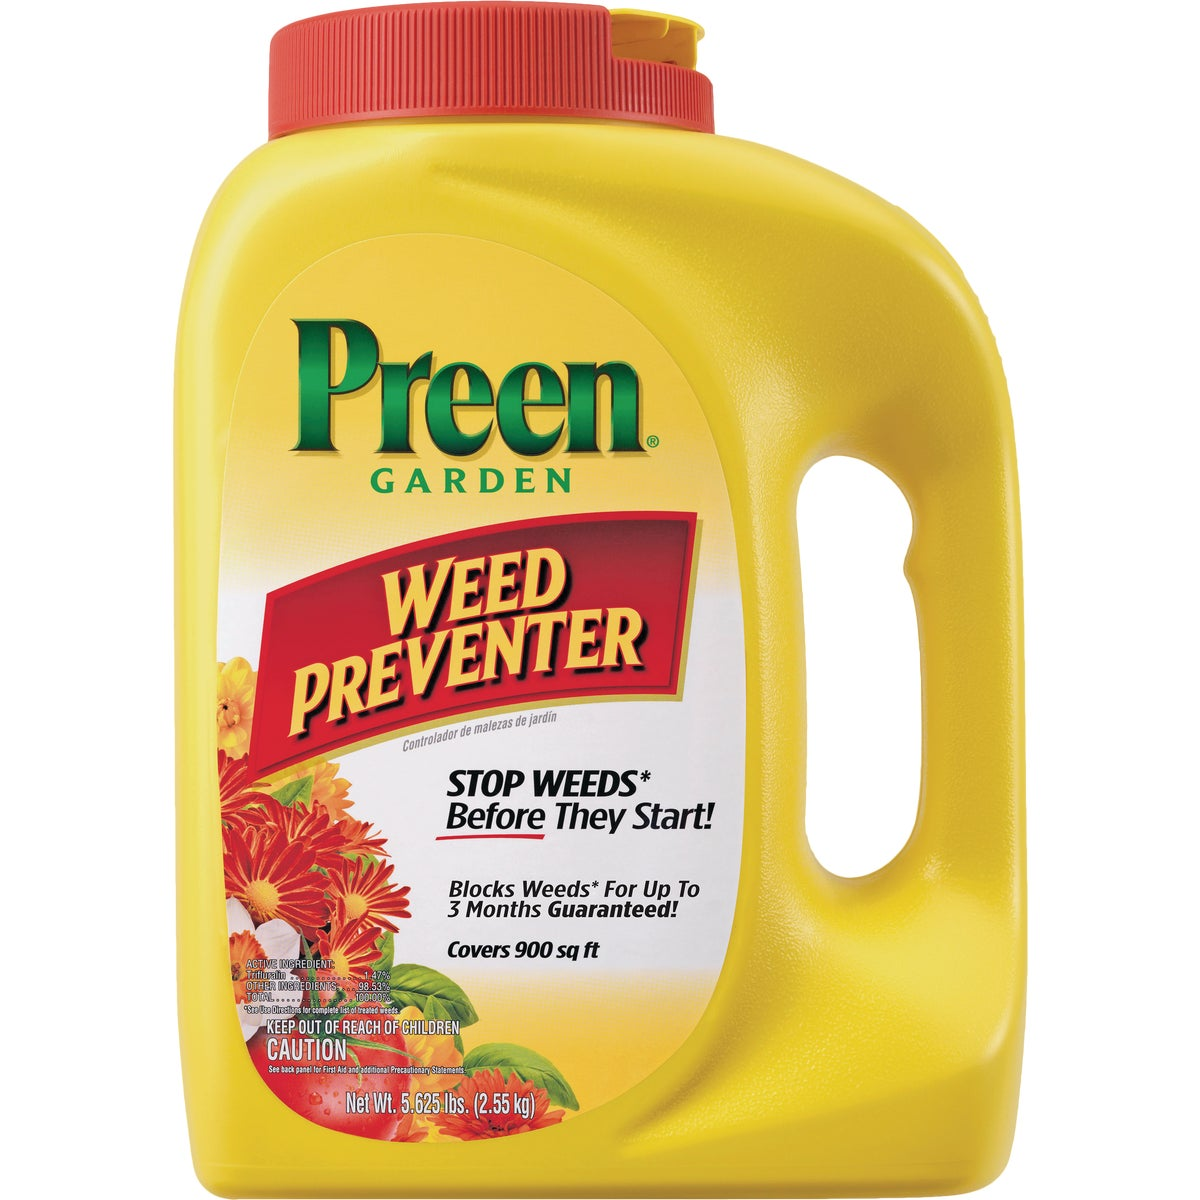 5.6#PREEN WEED PREVENTER